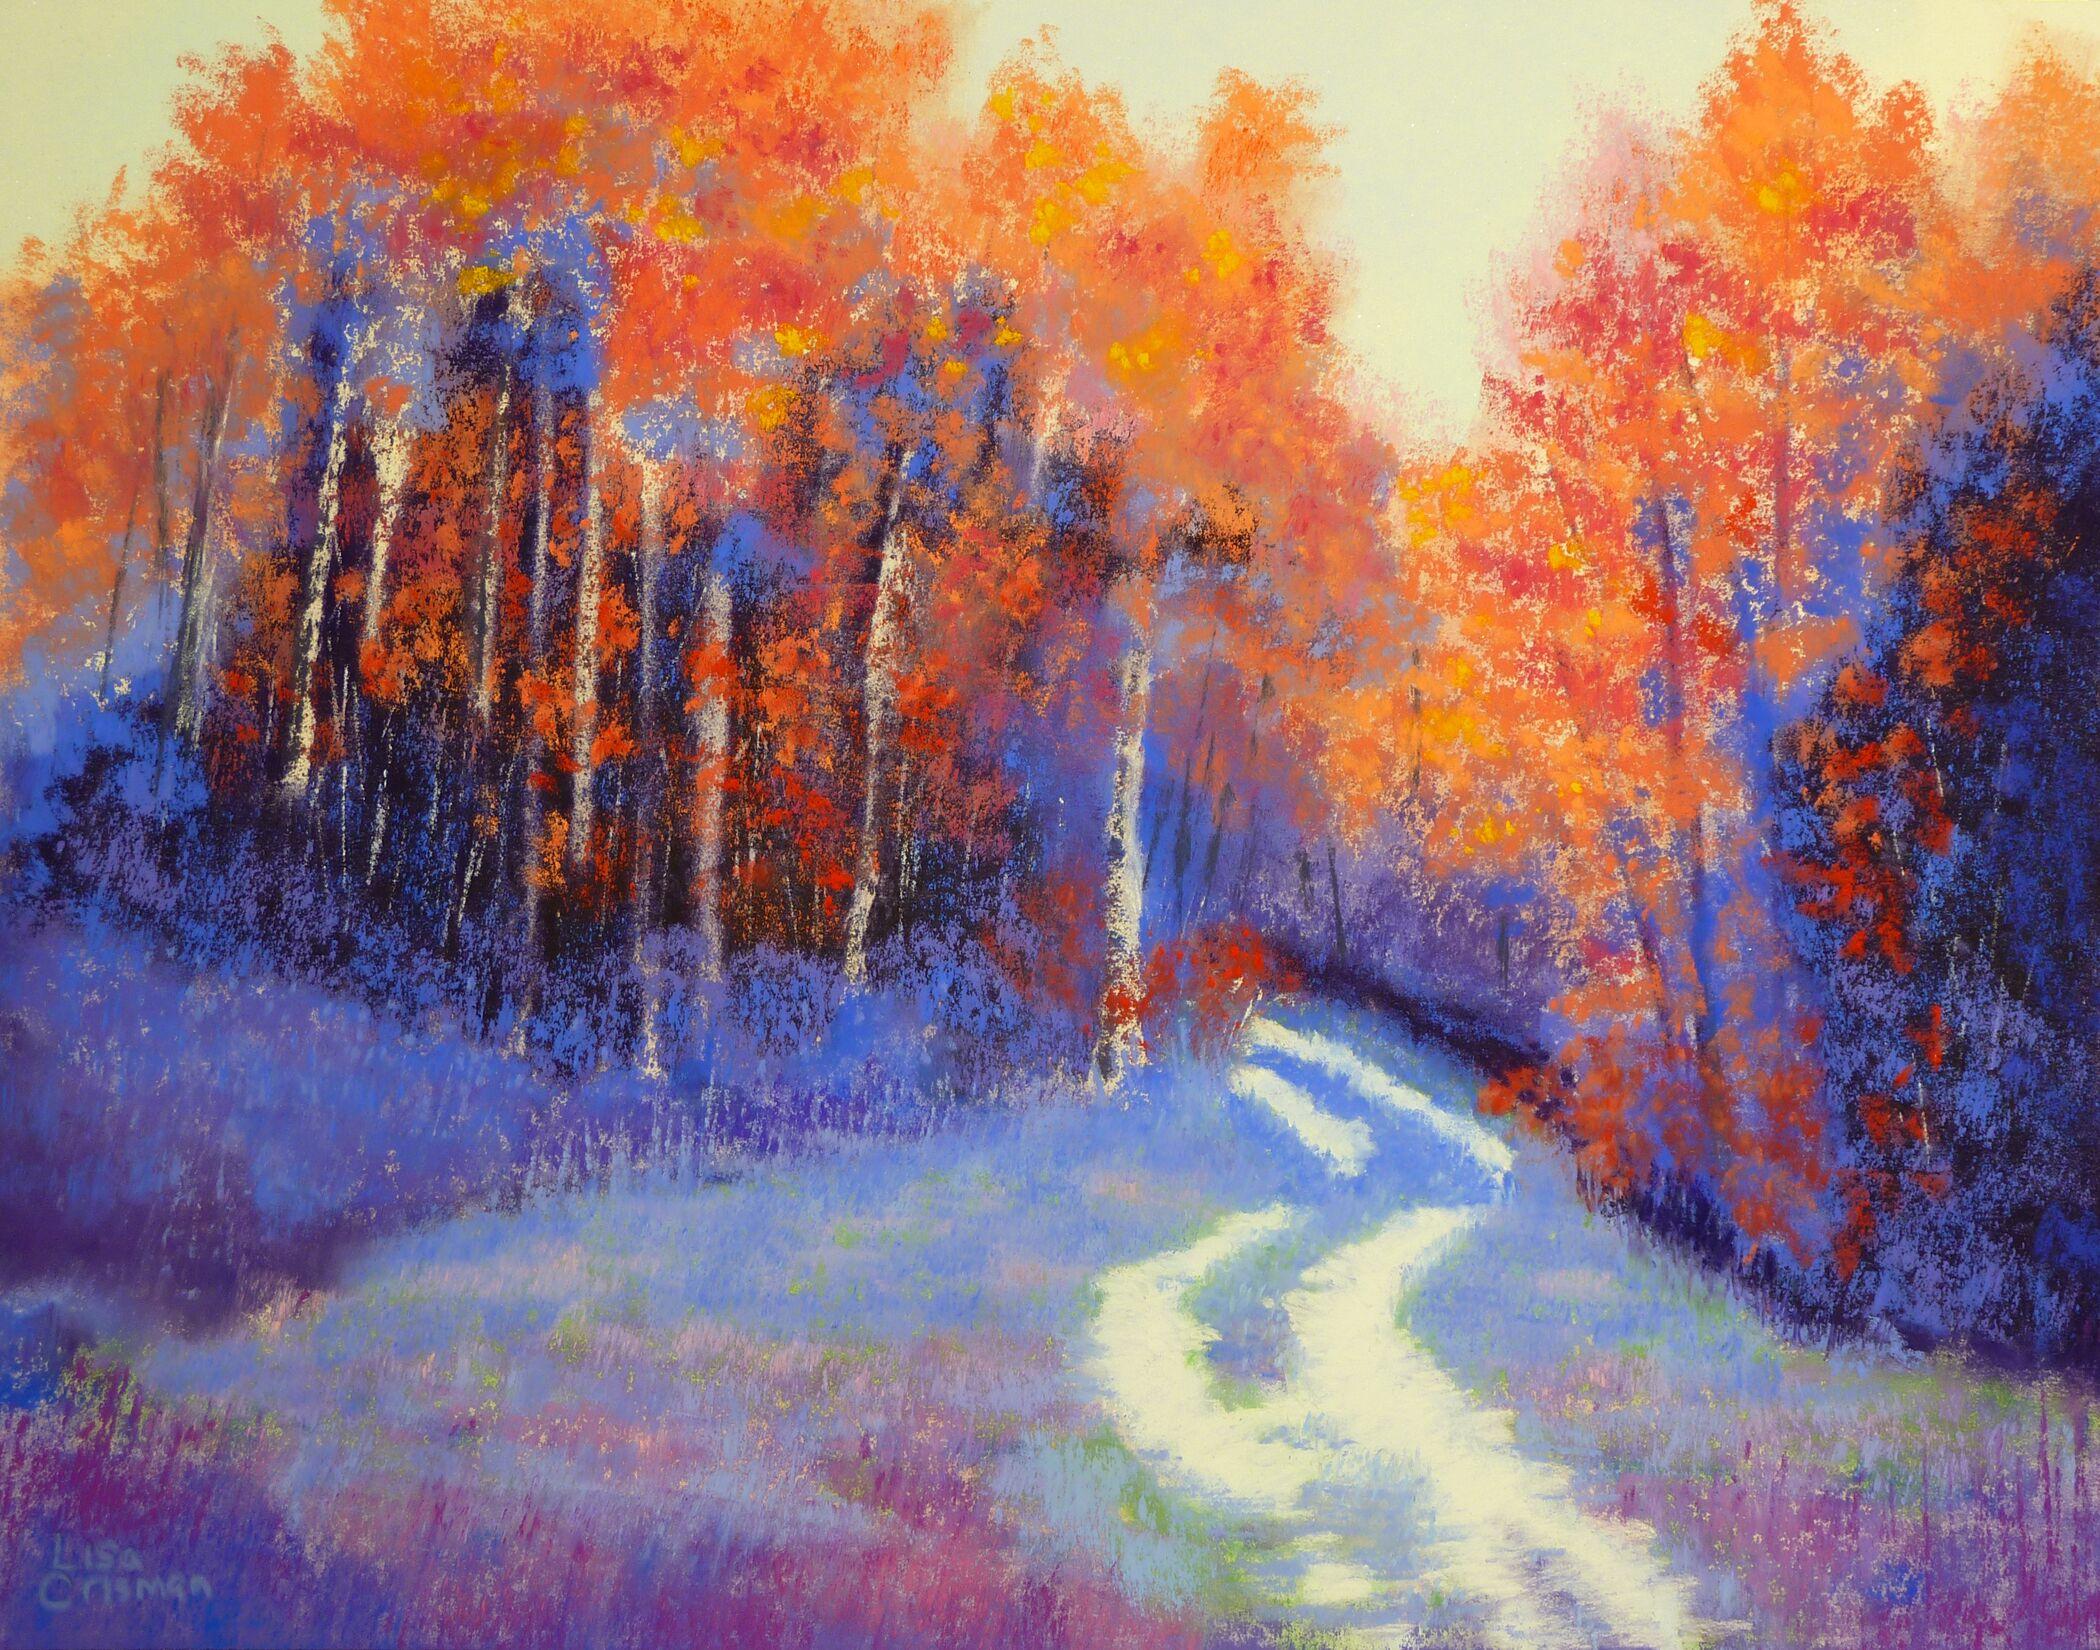 Lisa Crisman - Where the Path Leads